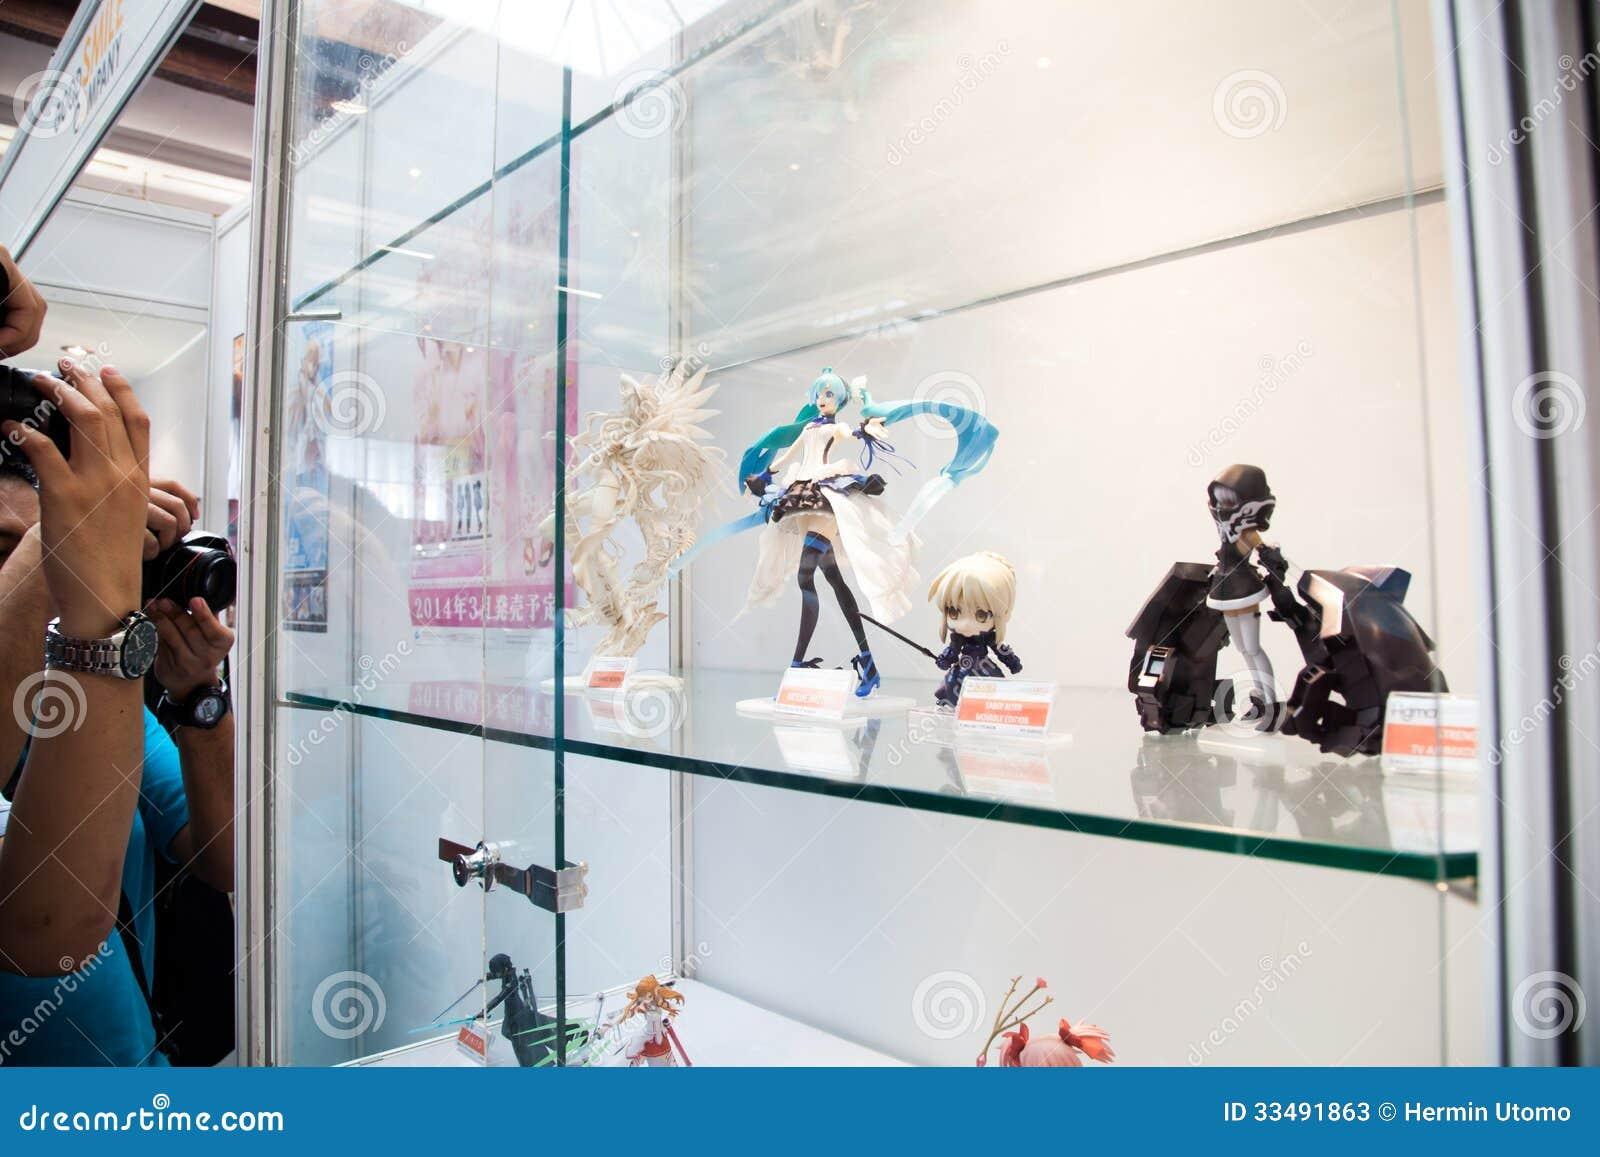 Anime Toy Figurine Showcase Editorial Stock Photo - Image: 33491863